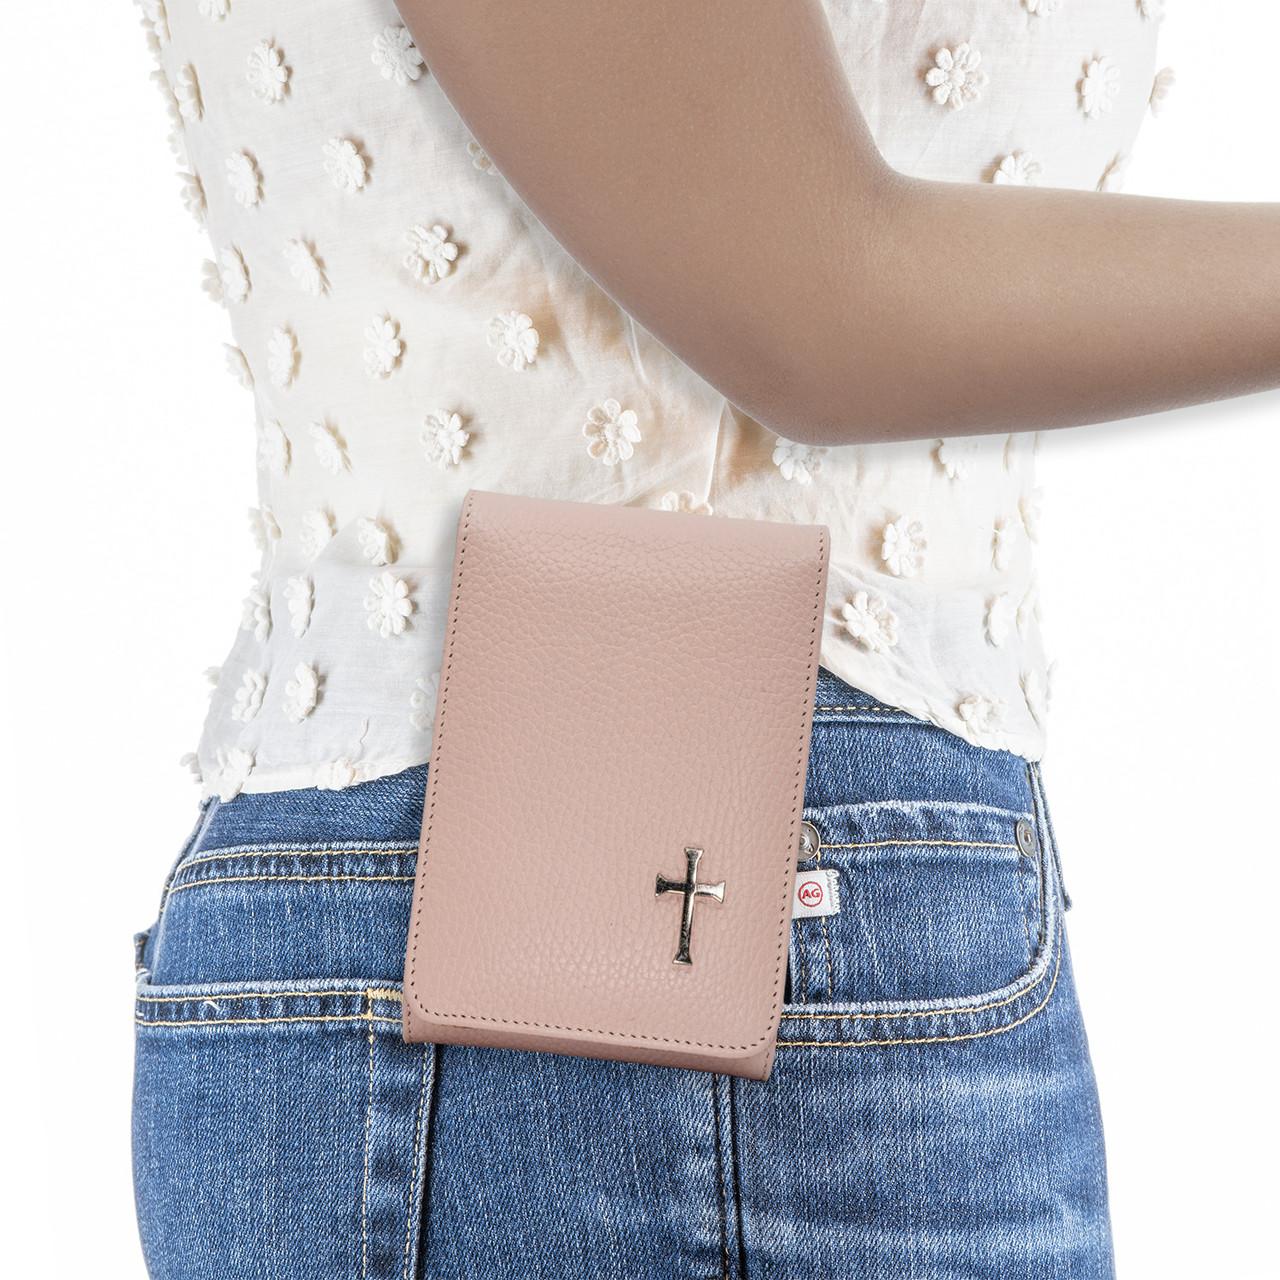 Taurus Spectrum Pink Carry Faithfully Cross Holster